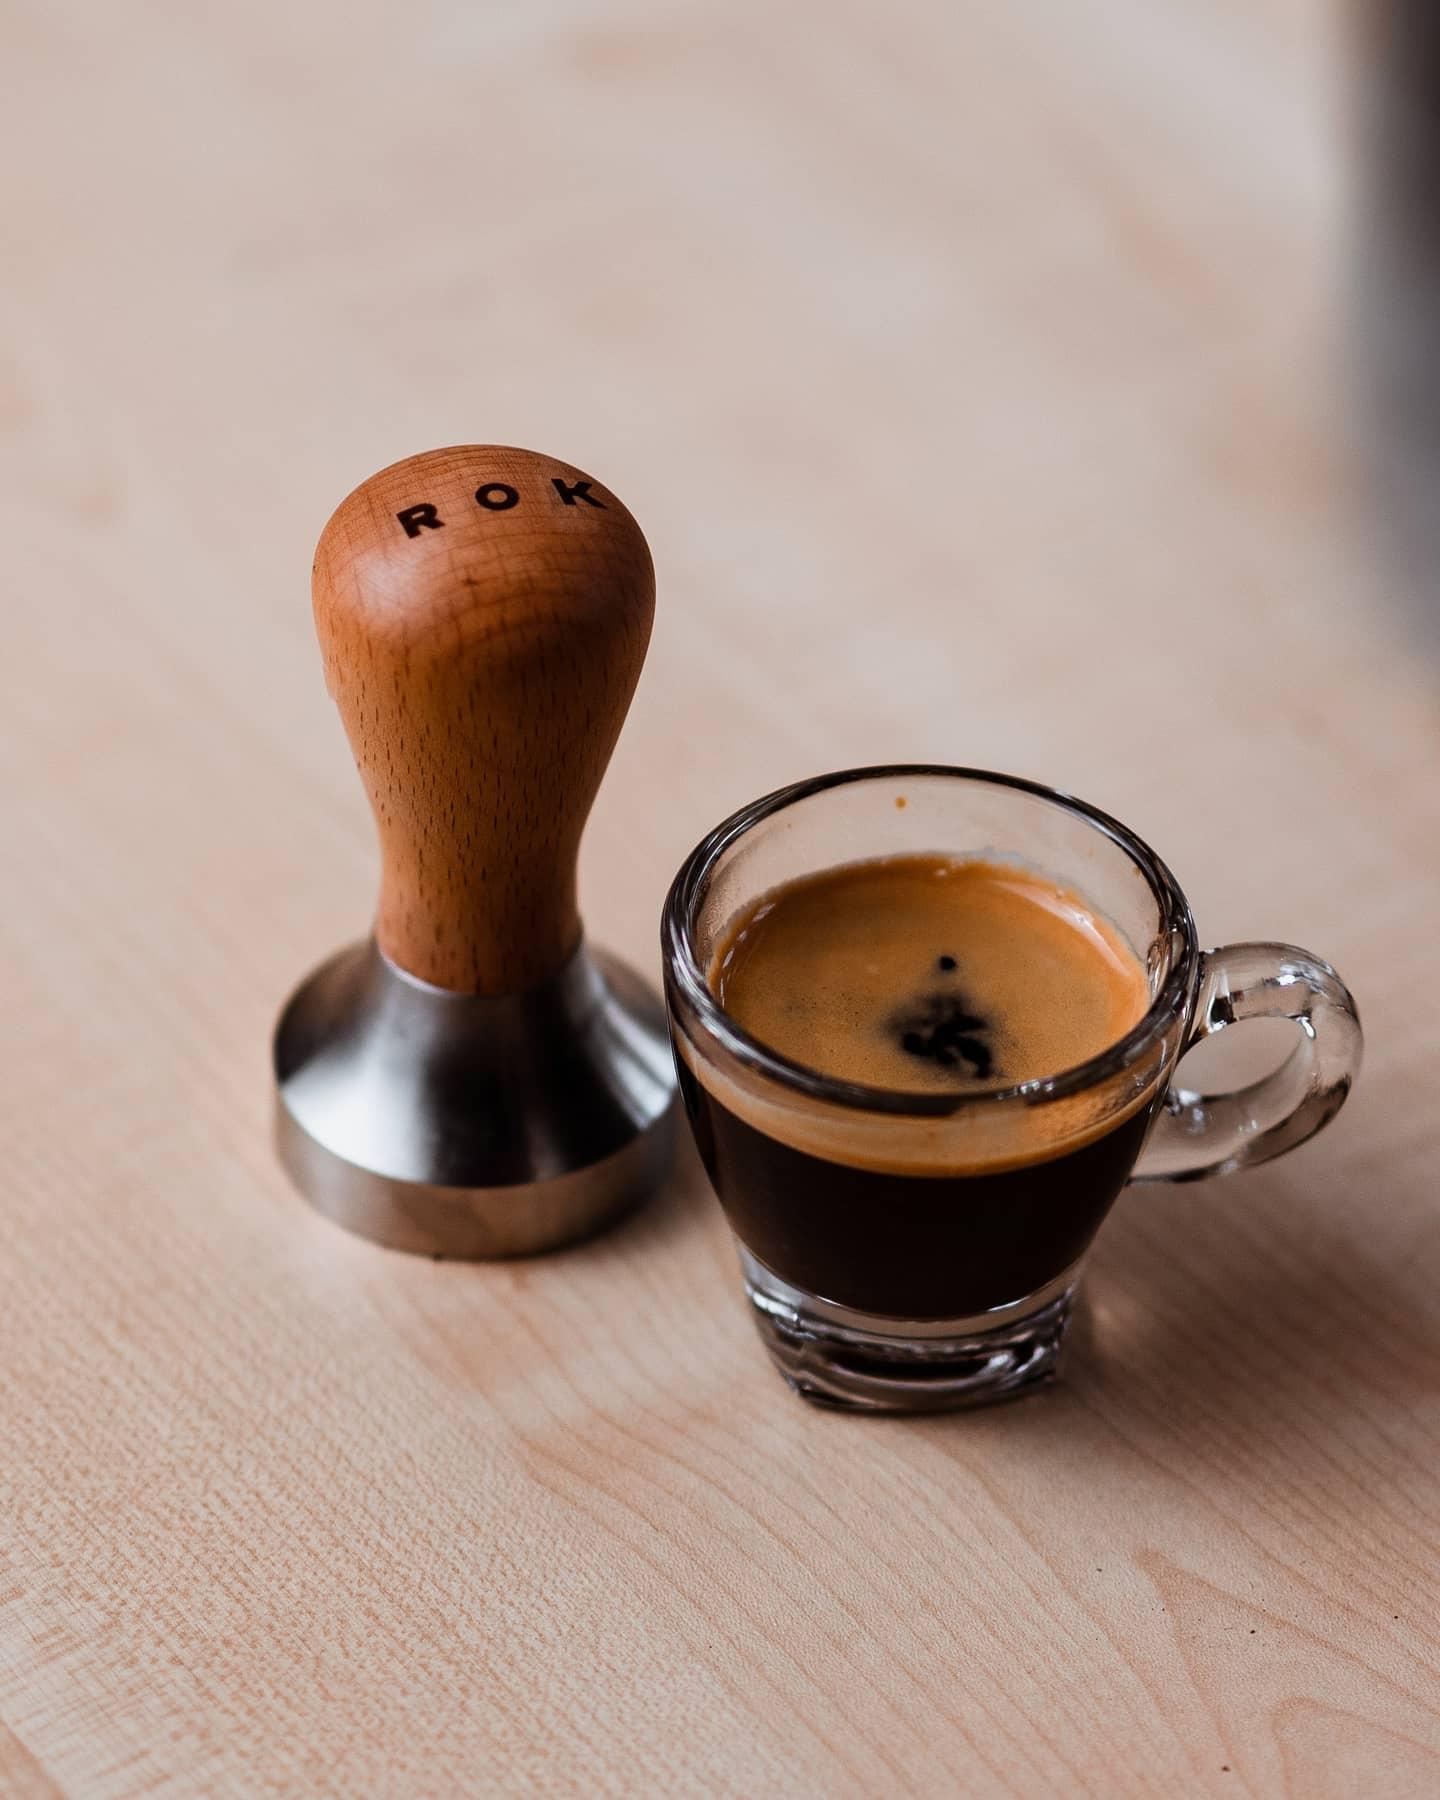 A great espresso shot starts with a great tamp!   #nakedportafilter #thirdwavecoffee #coffeephotography #coffeeshots #instacoffee #goodcoffee #kahve #manualbrewonly #perfectdailygrind #masfotokopi #manmakecoffee #alternativebrewing #coffeelover #baristadaily #coffeeaddict #homebarista #morningbrew #coffeemania #coffeevibes #roasterdaily #thingsaboutcoffee #Кофе #kawa #rokcoffee #coffeeteller